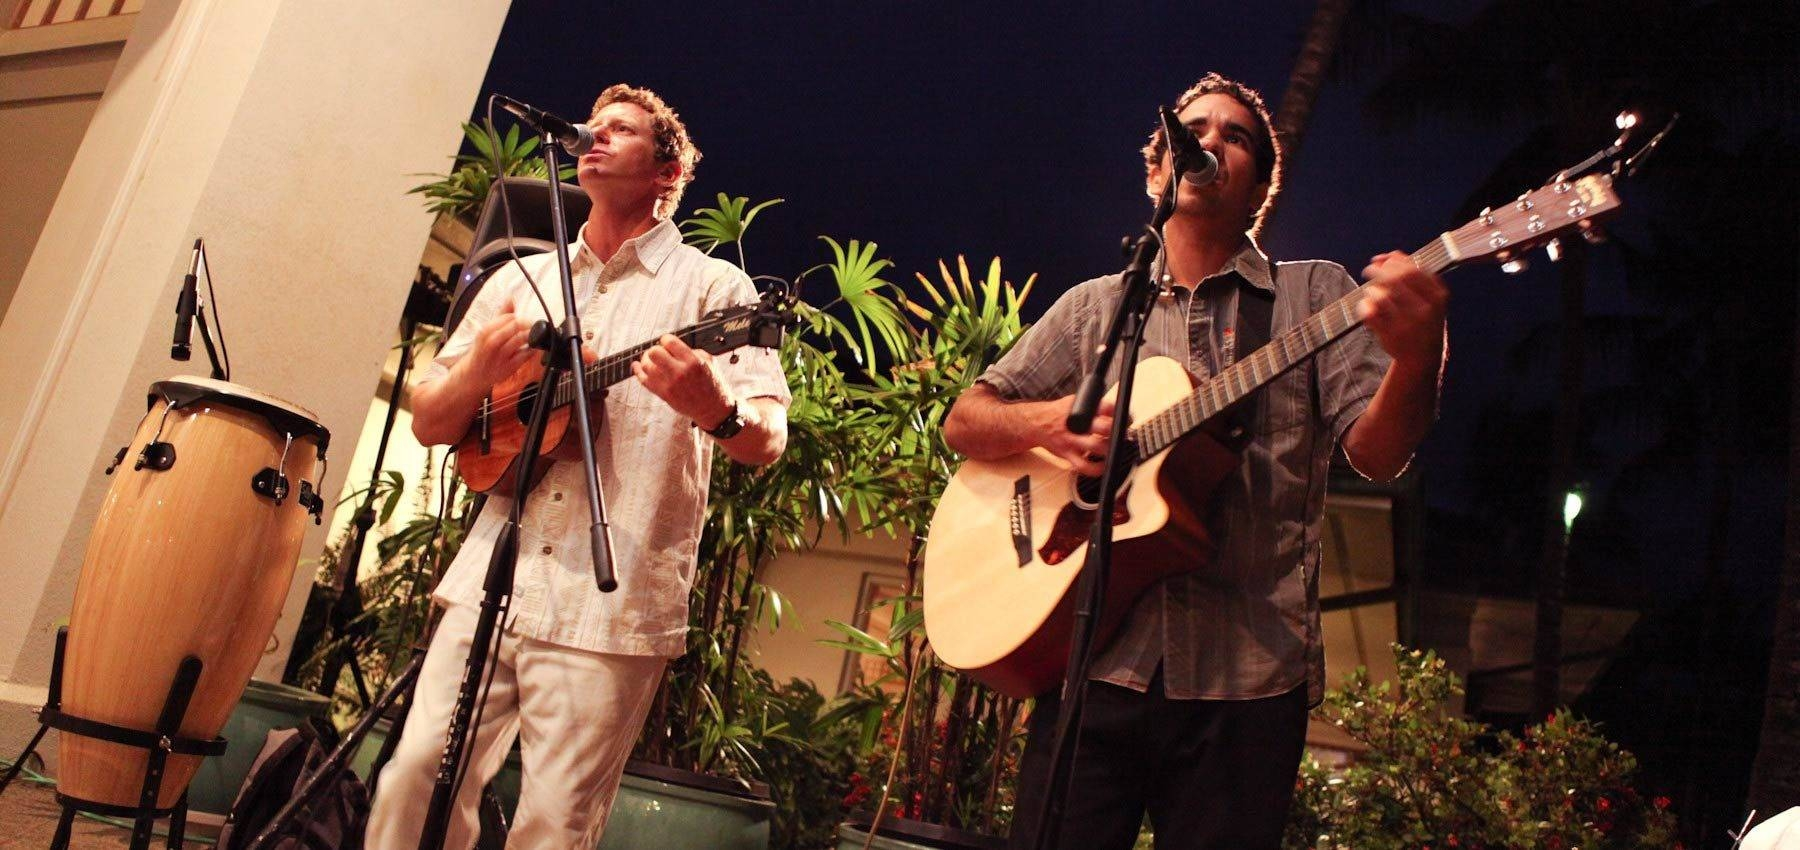 Maui Musicians – Barefoot Minded | Maui Wedding Musicians Pertaining To Current Maui Wedding Bands (View 14 of 15)